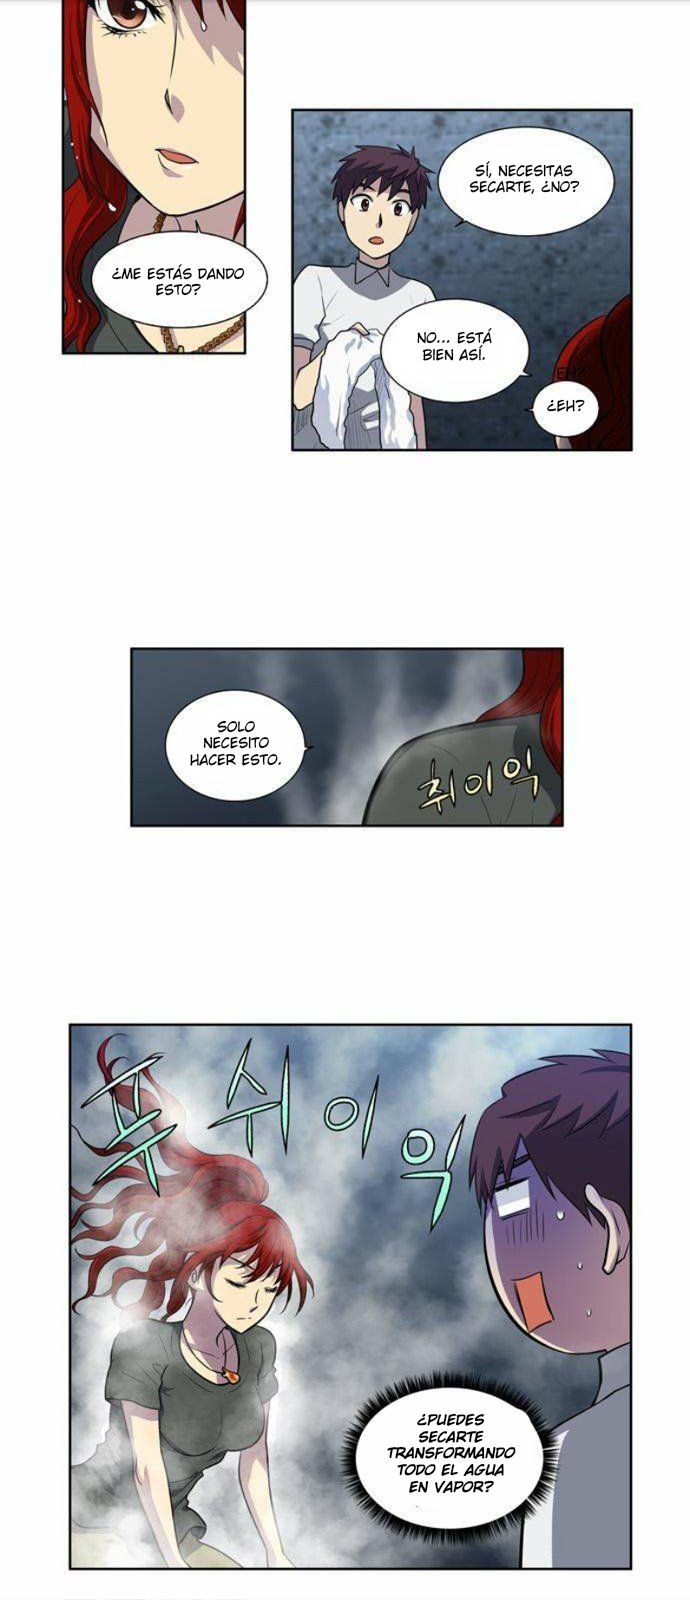 http://c5.ninemanga.com/es_manga/61/1725/487801/2d6367ec6a3ccd407ef5b5fff53f82d9.jpg Page 7